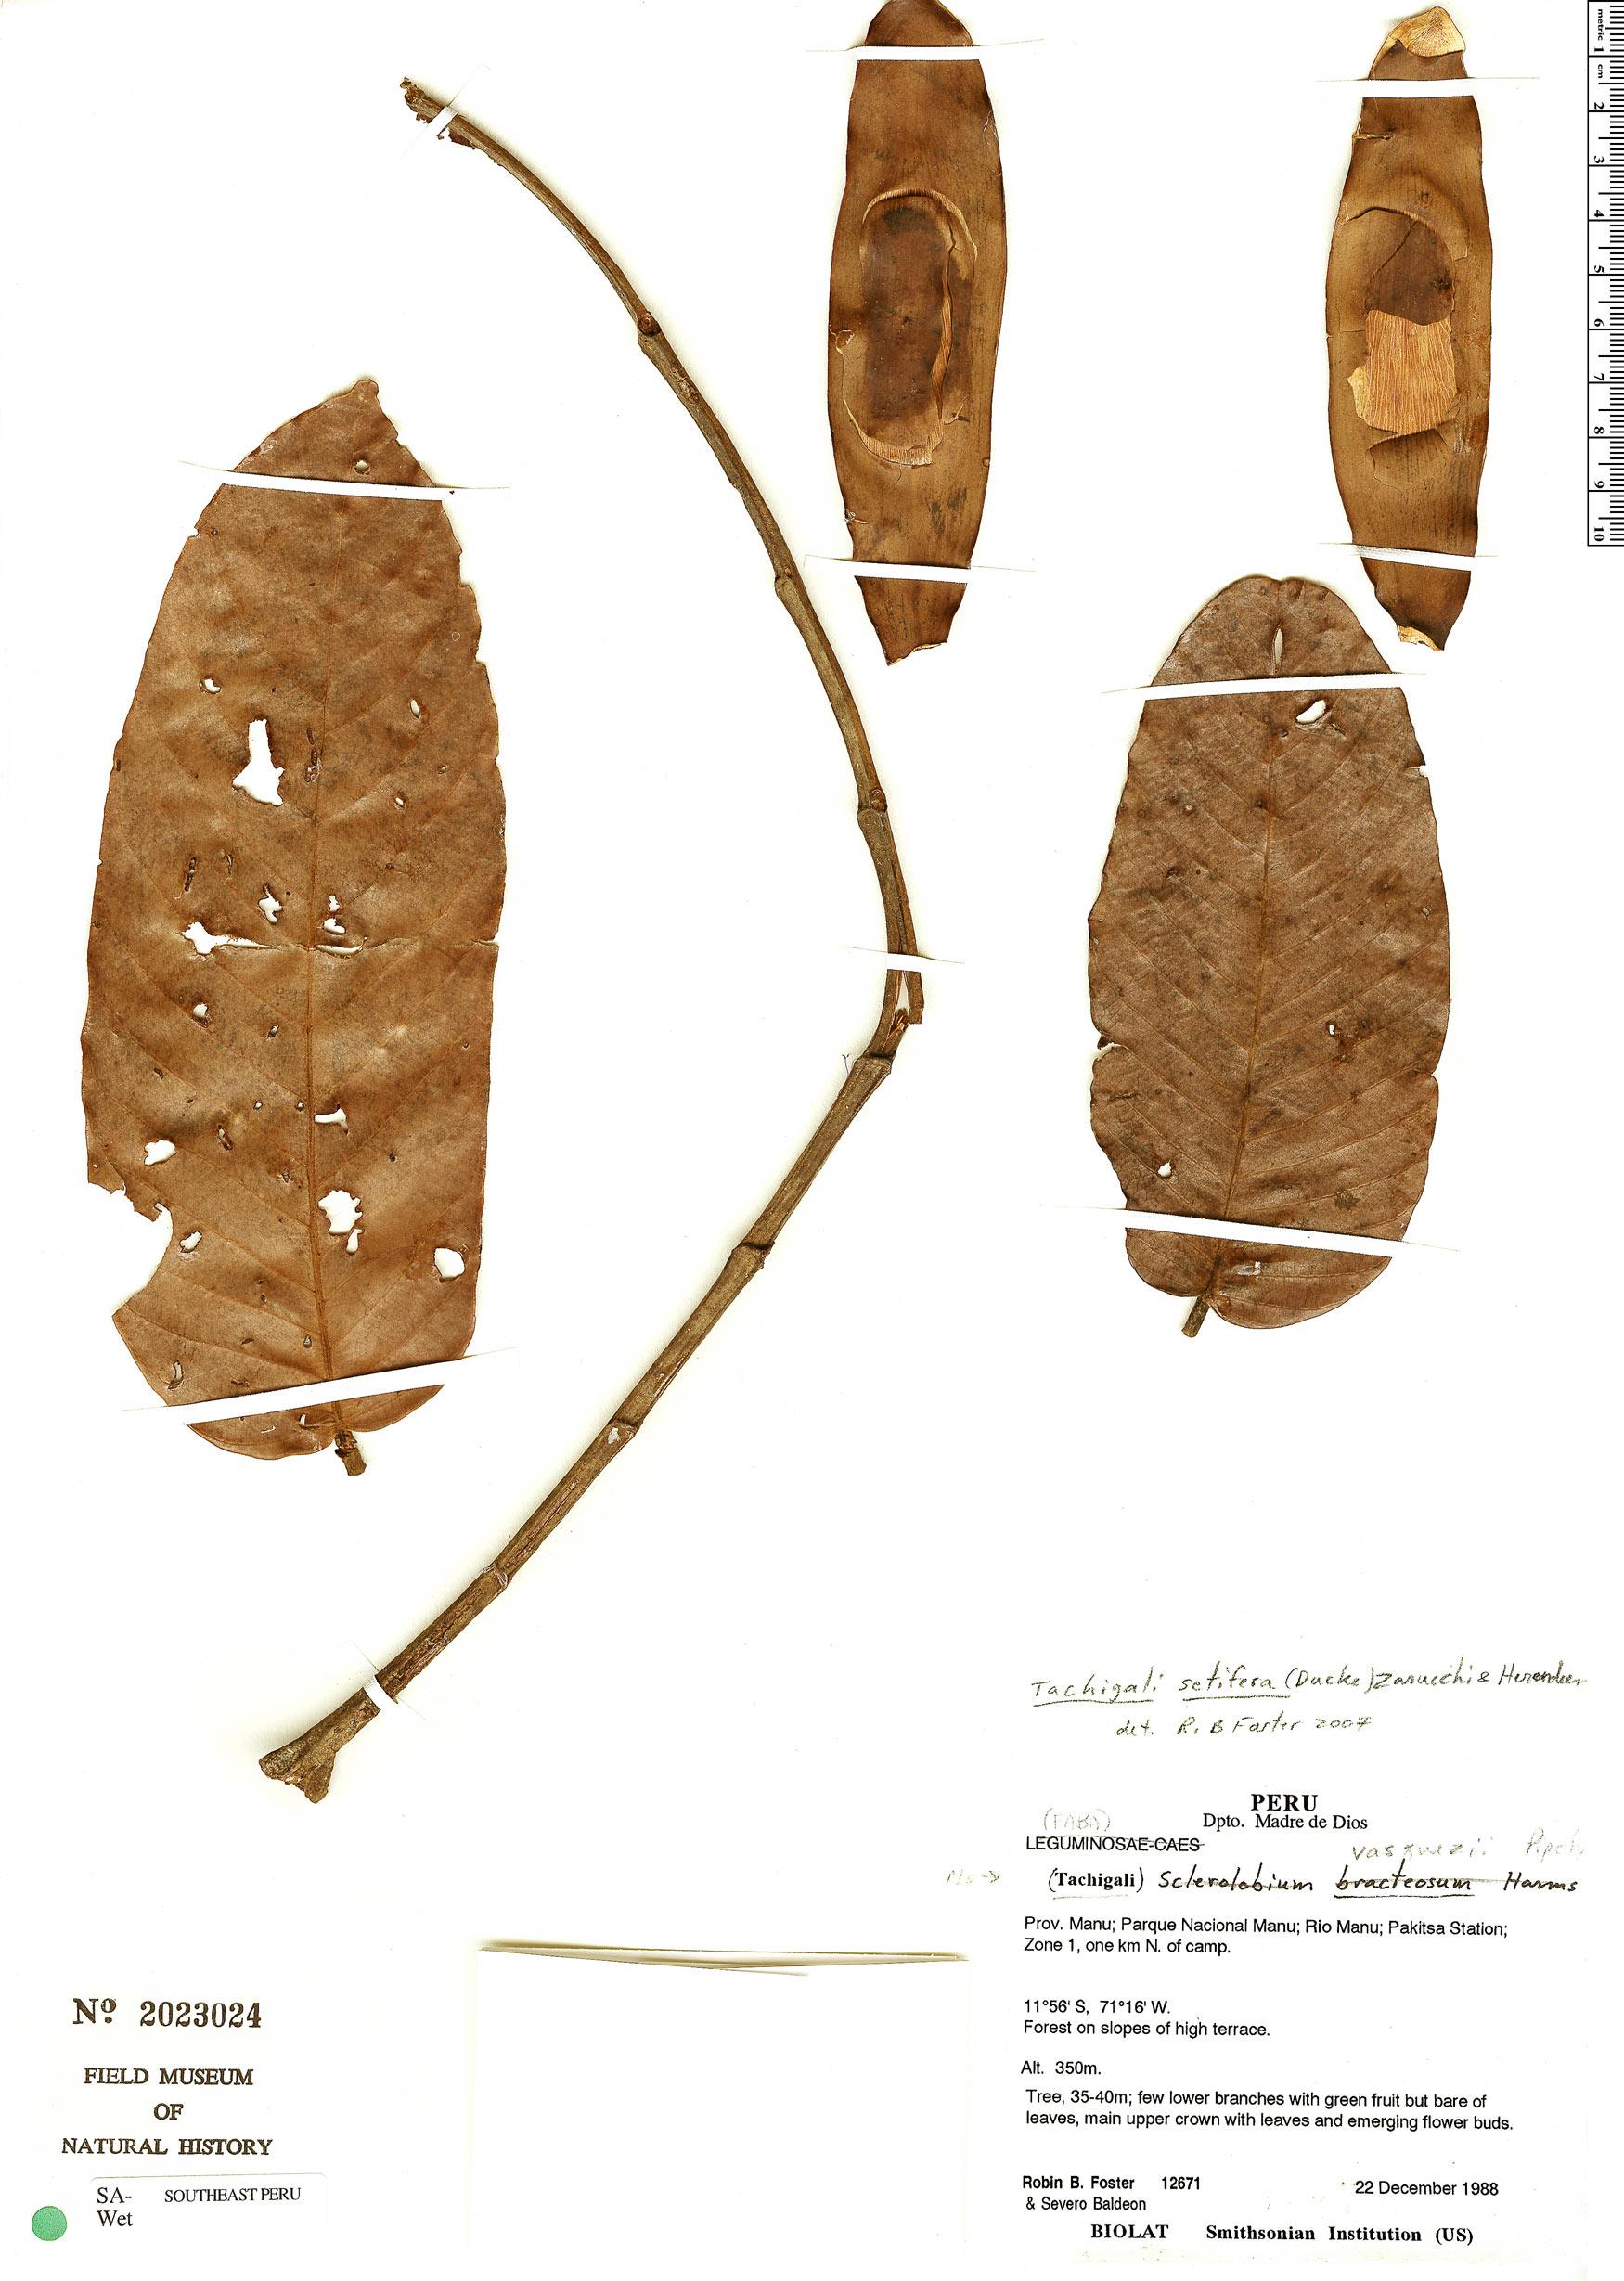 Specimen: Tachigali setifera